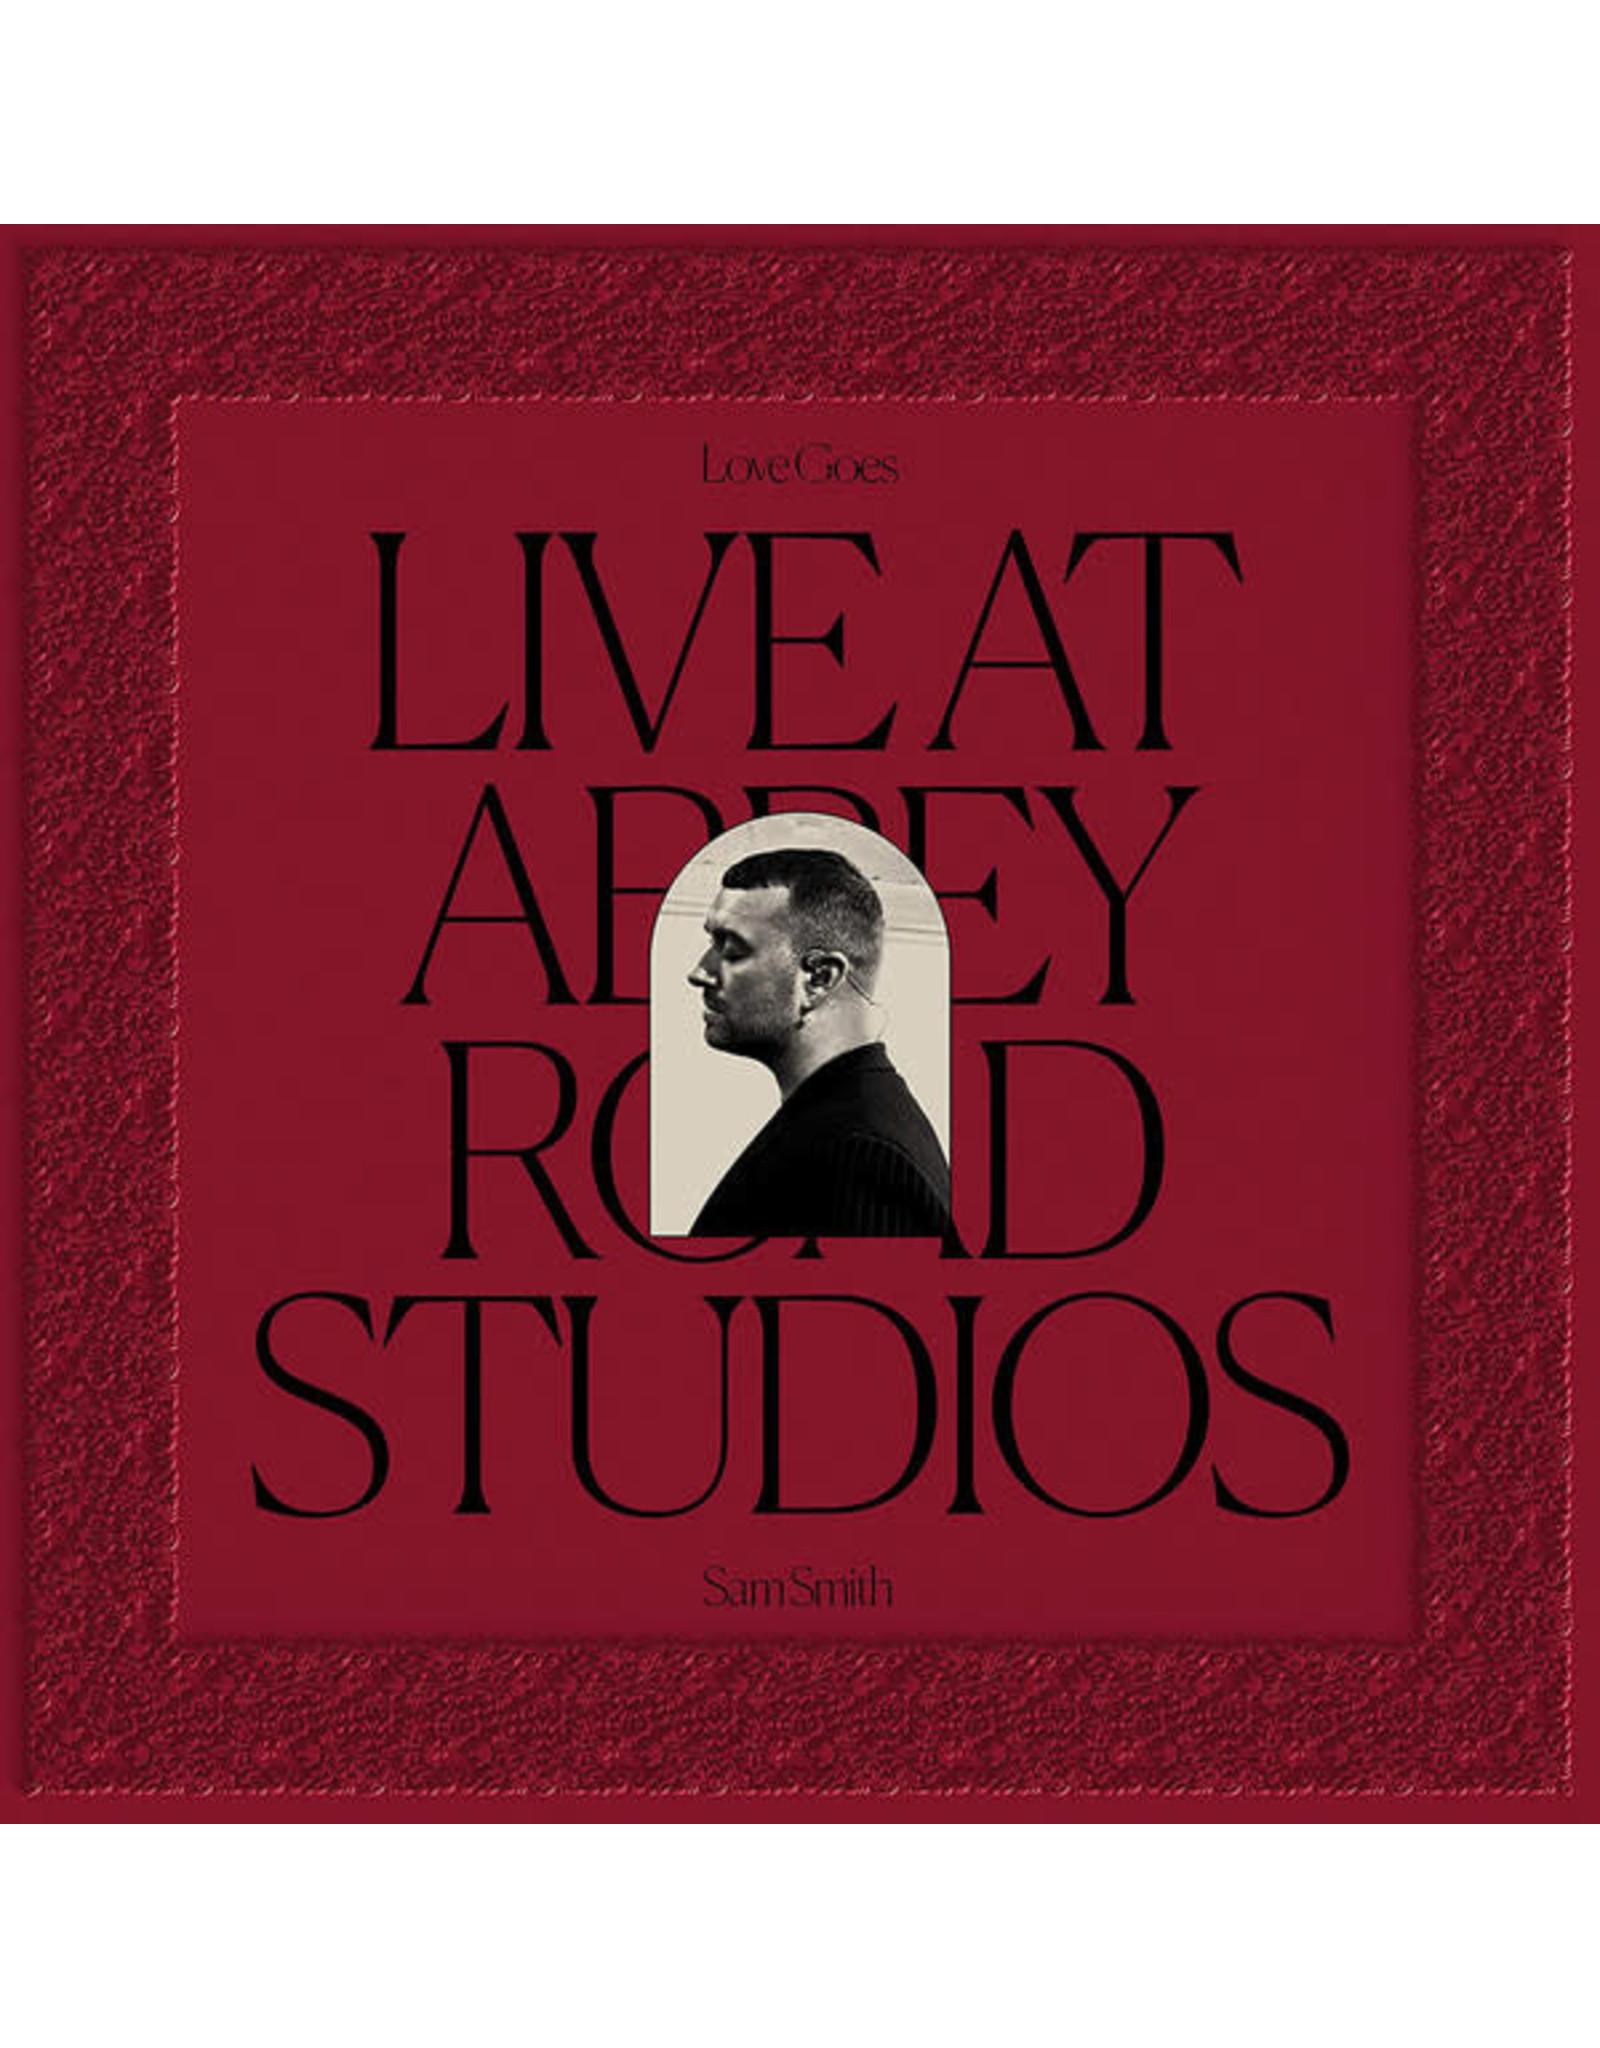 Smith, Sam / Live At Abbey Road Studios